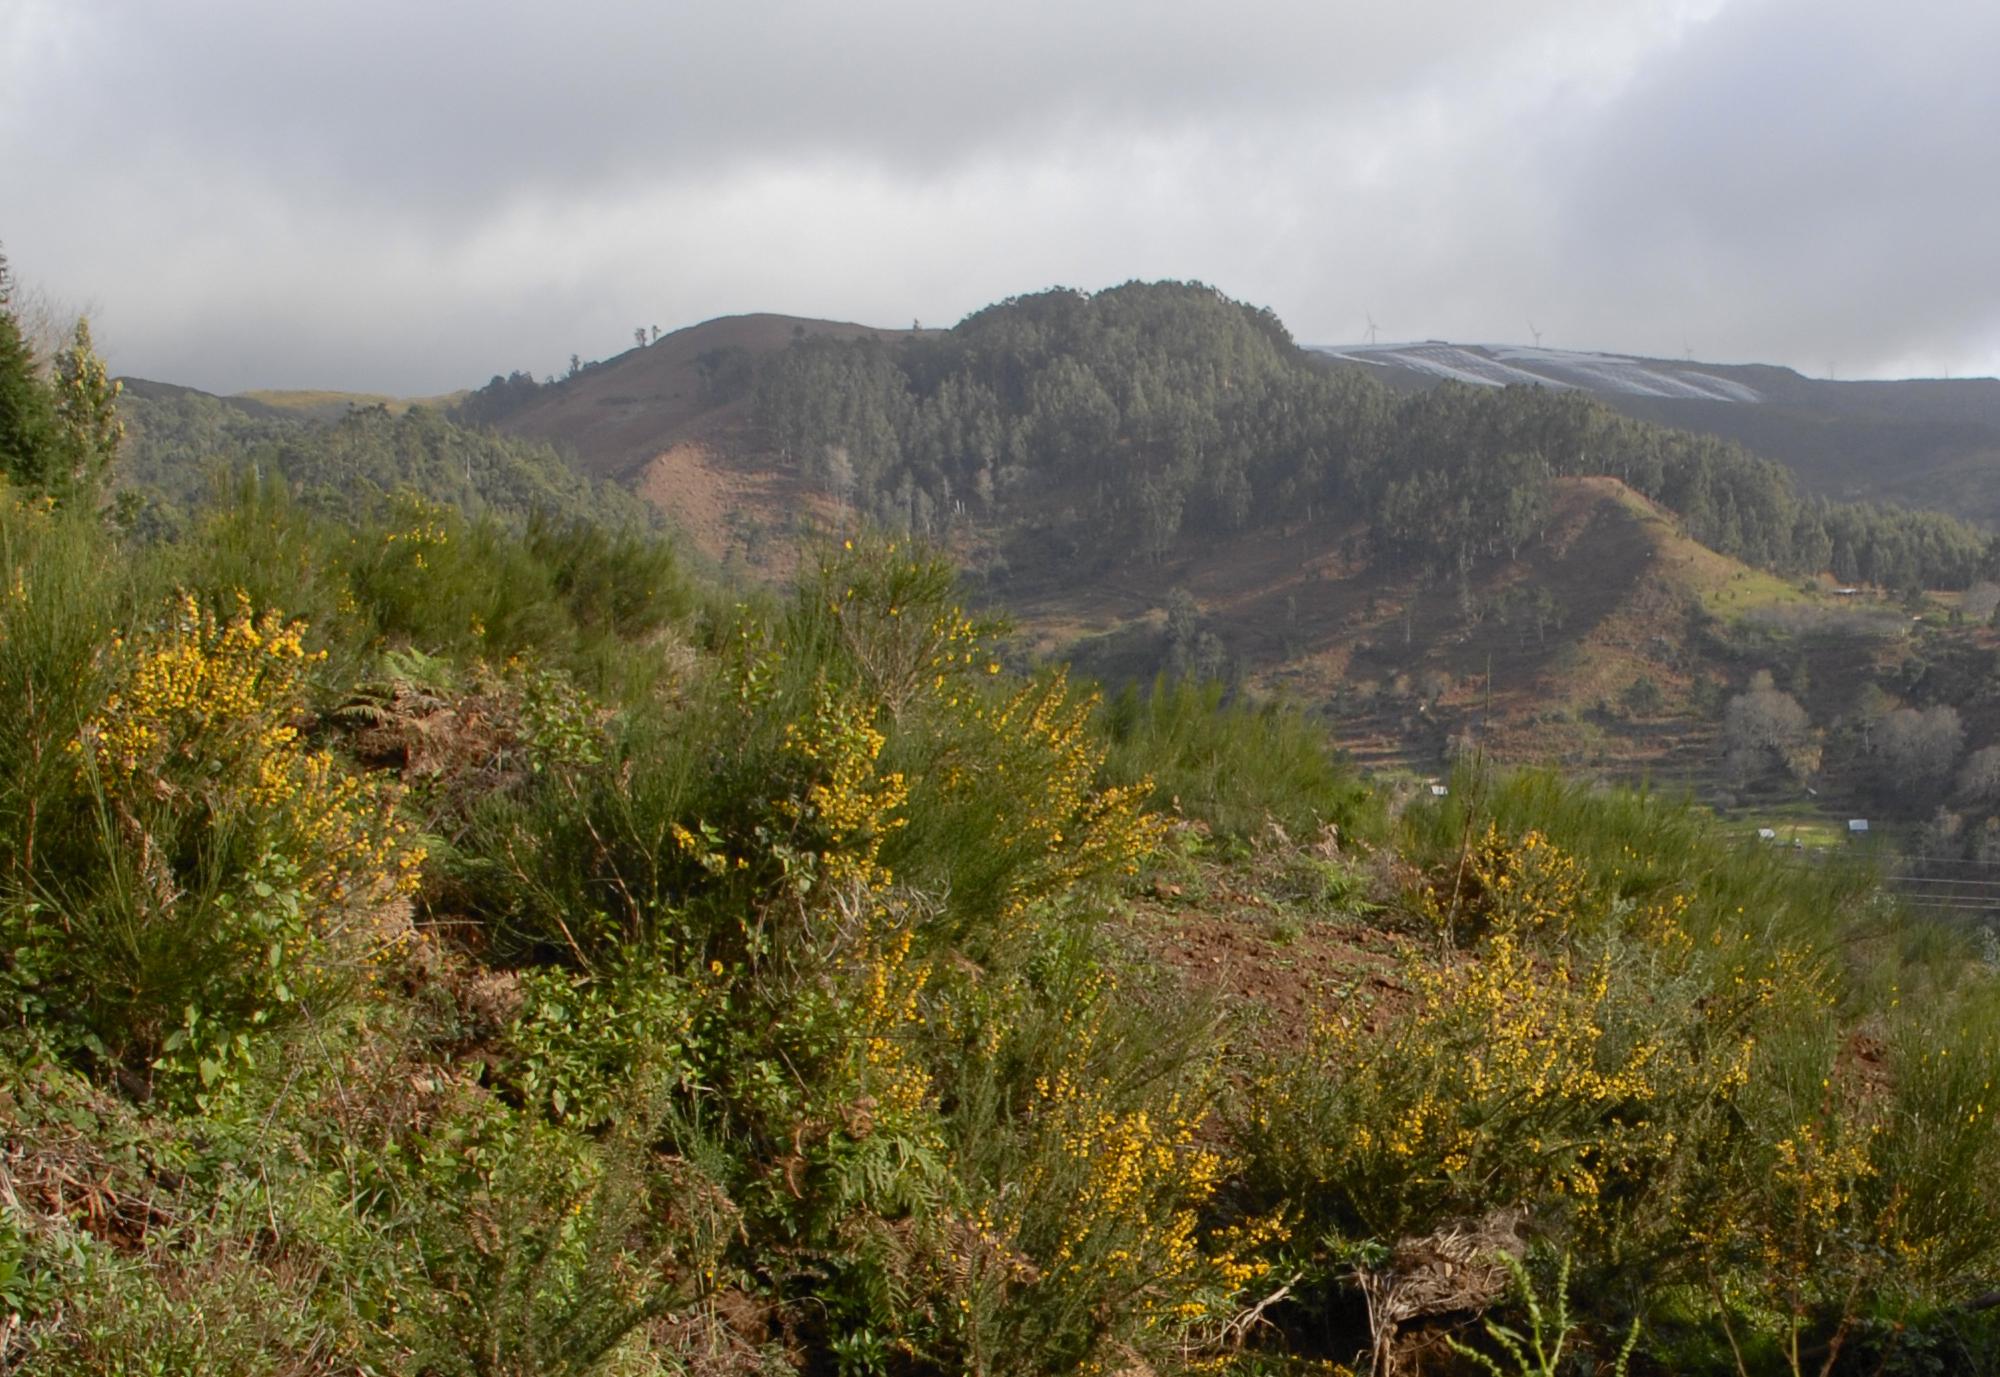 Consulta Pública: Projeto de Sobreequipamento ENEREEM- Parque Eólico do Loiral III, Paul da Serra